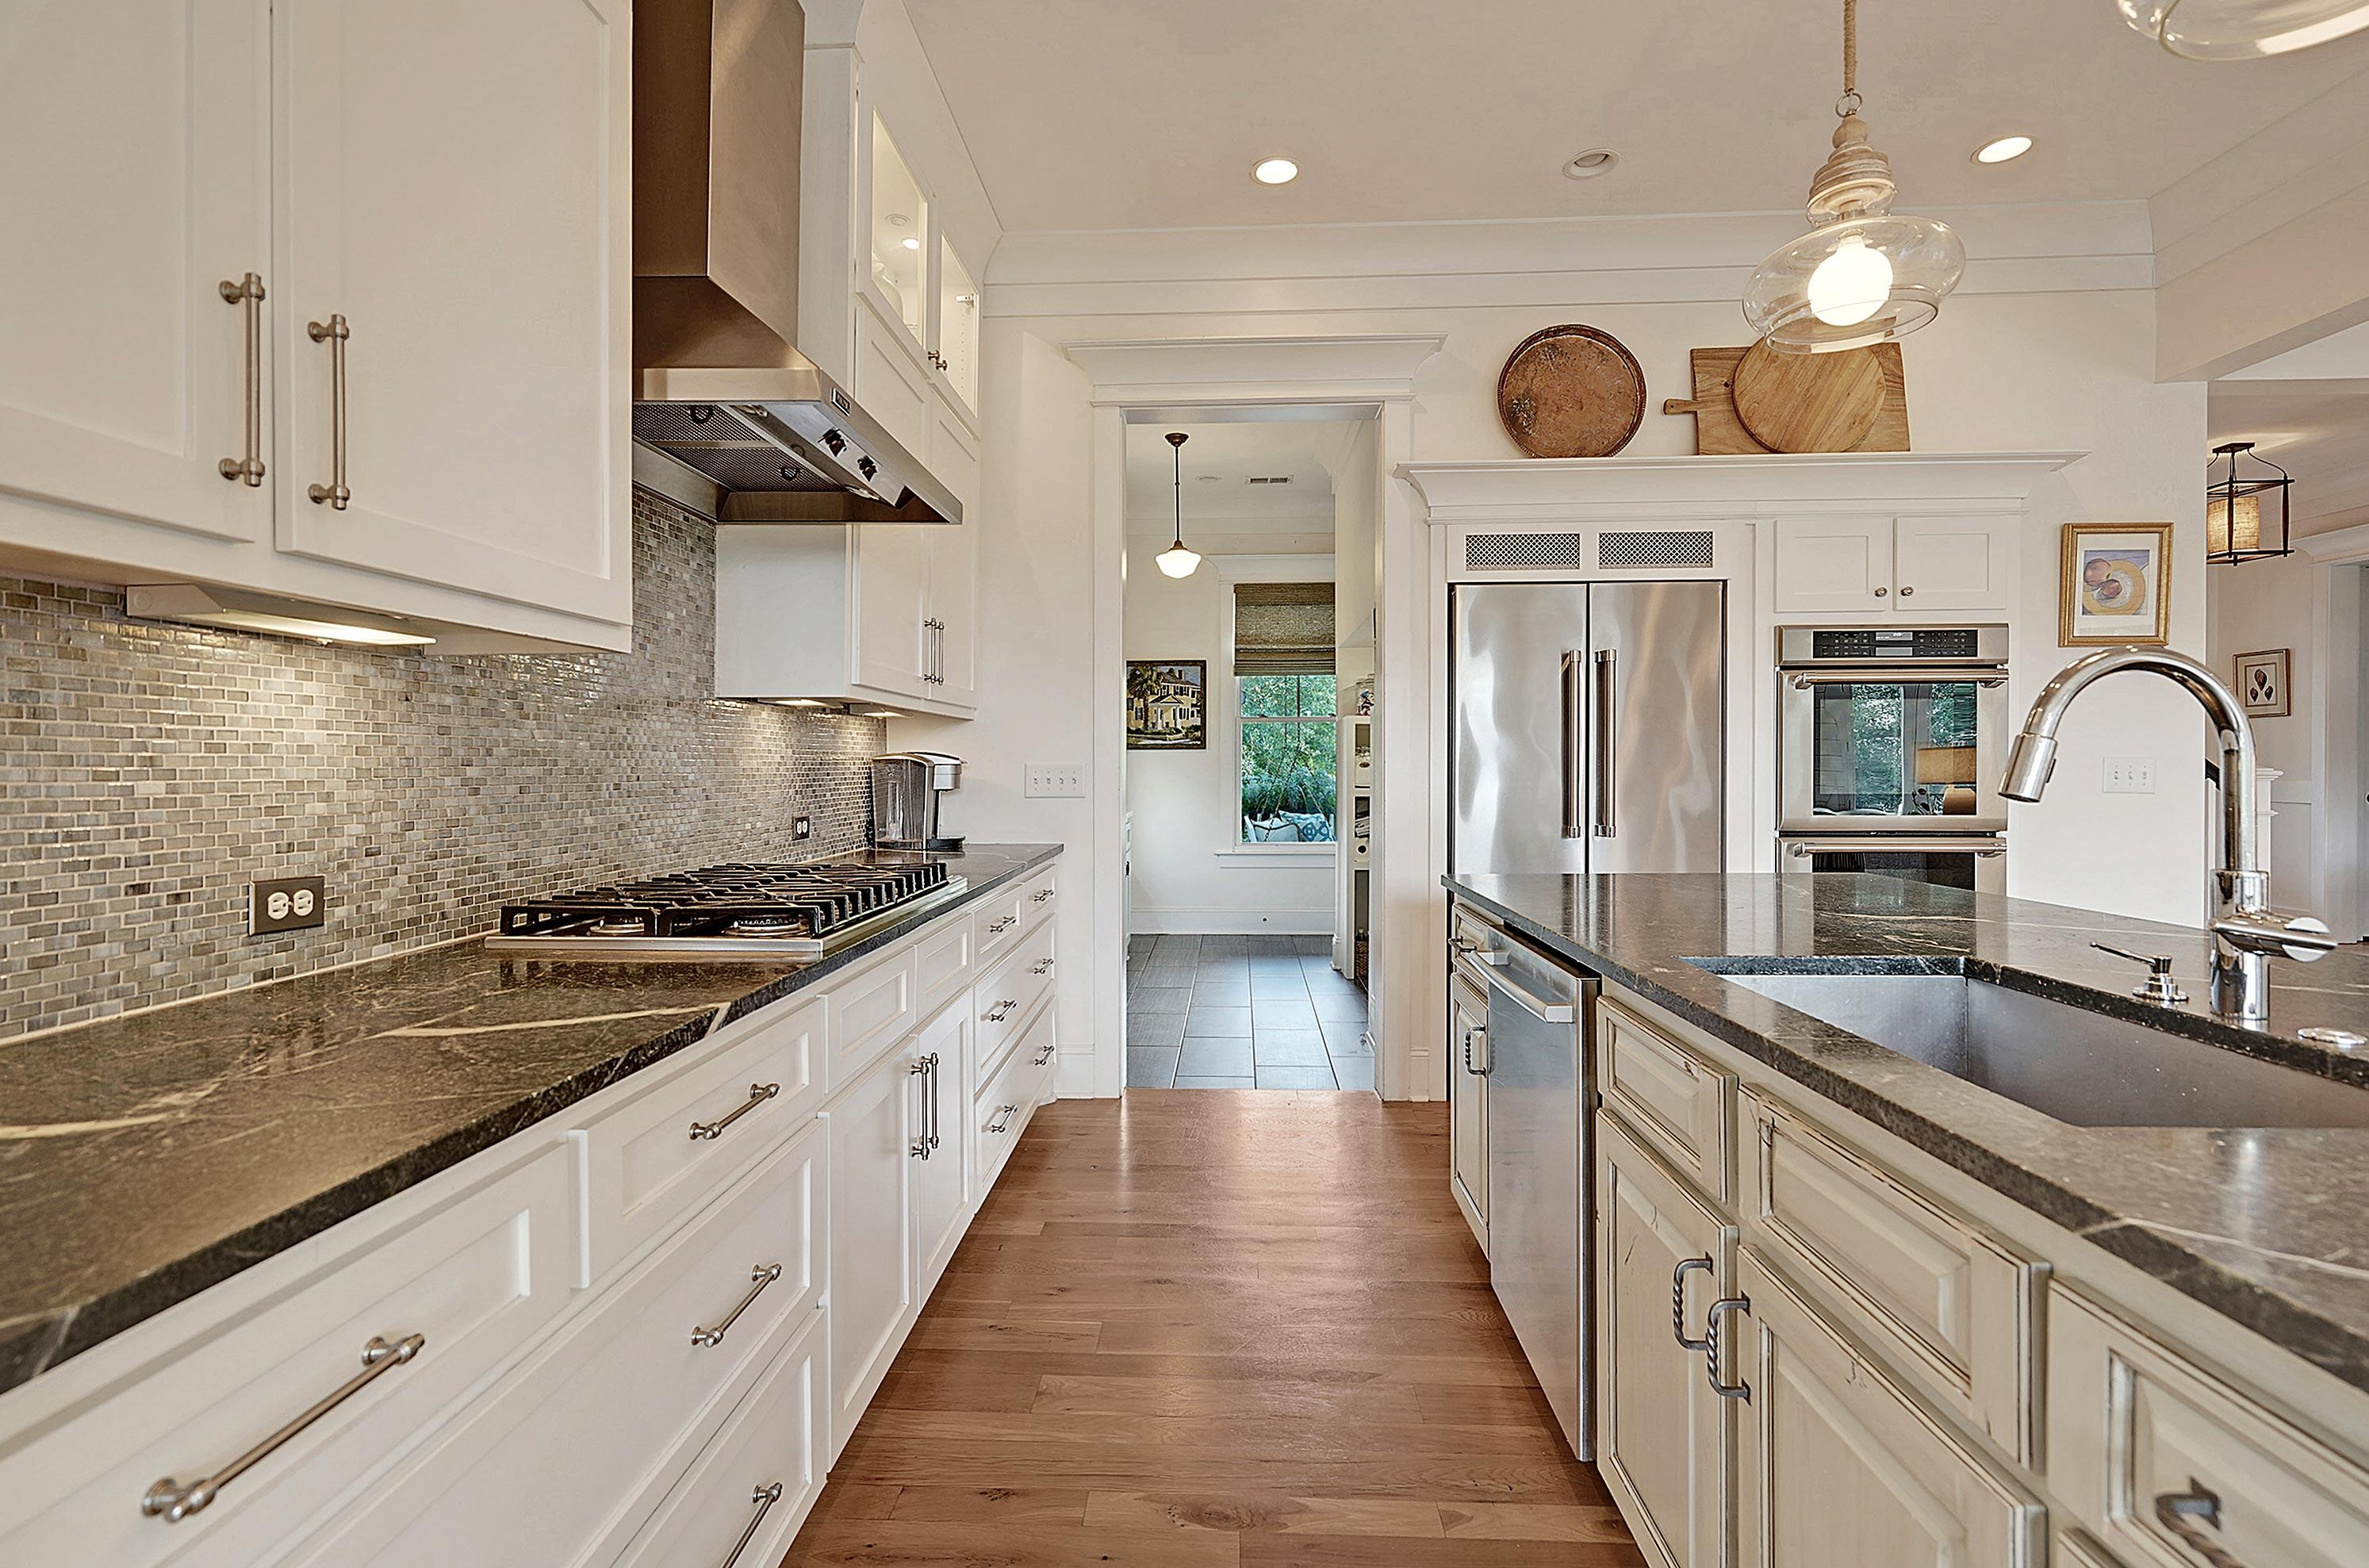 Grassy Creek Homes For Sale - 294 River Oak, Mount Pleasant, SC - 44